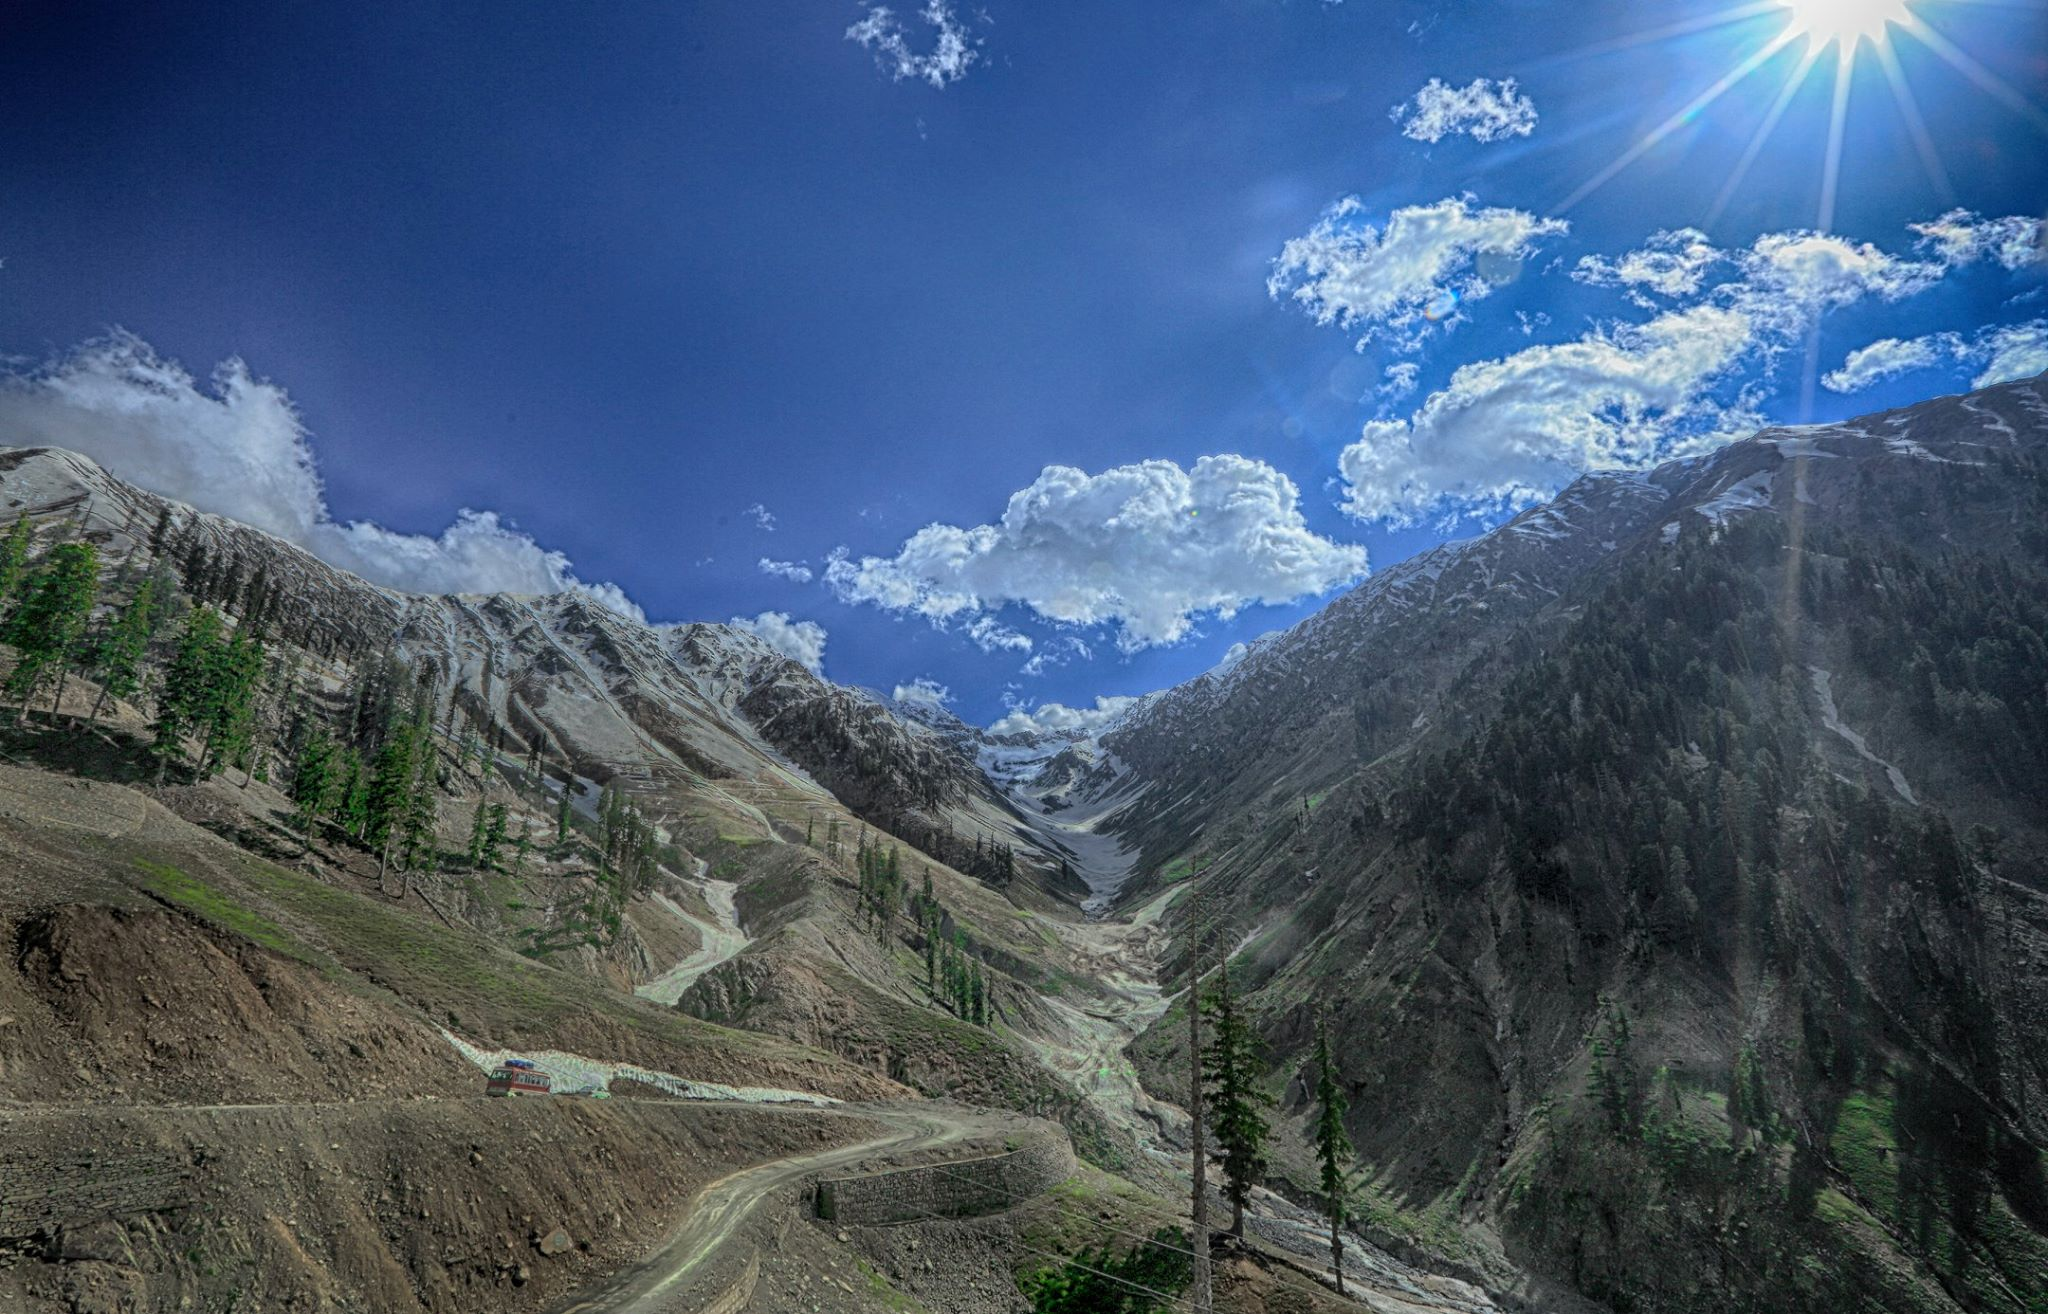 Lowari Top / Pass & Lowari Tunnel - Beautiful Top Pass in Pakistan